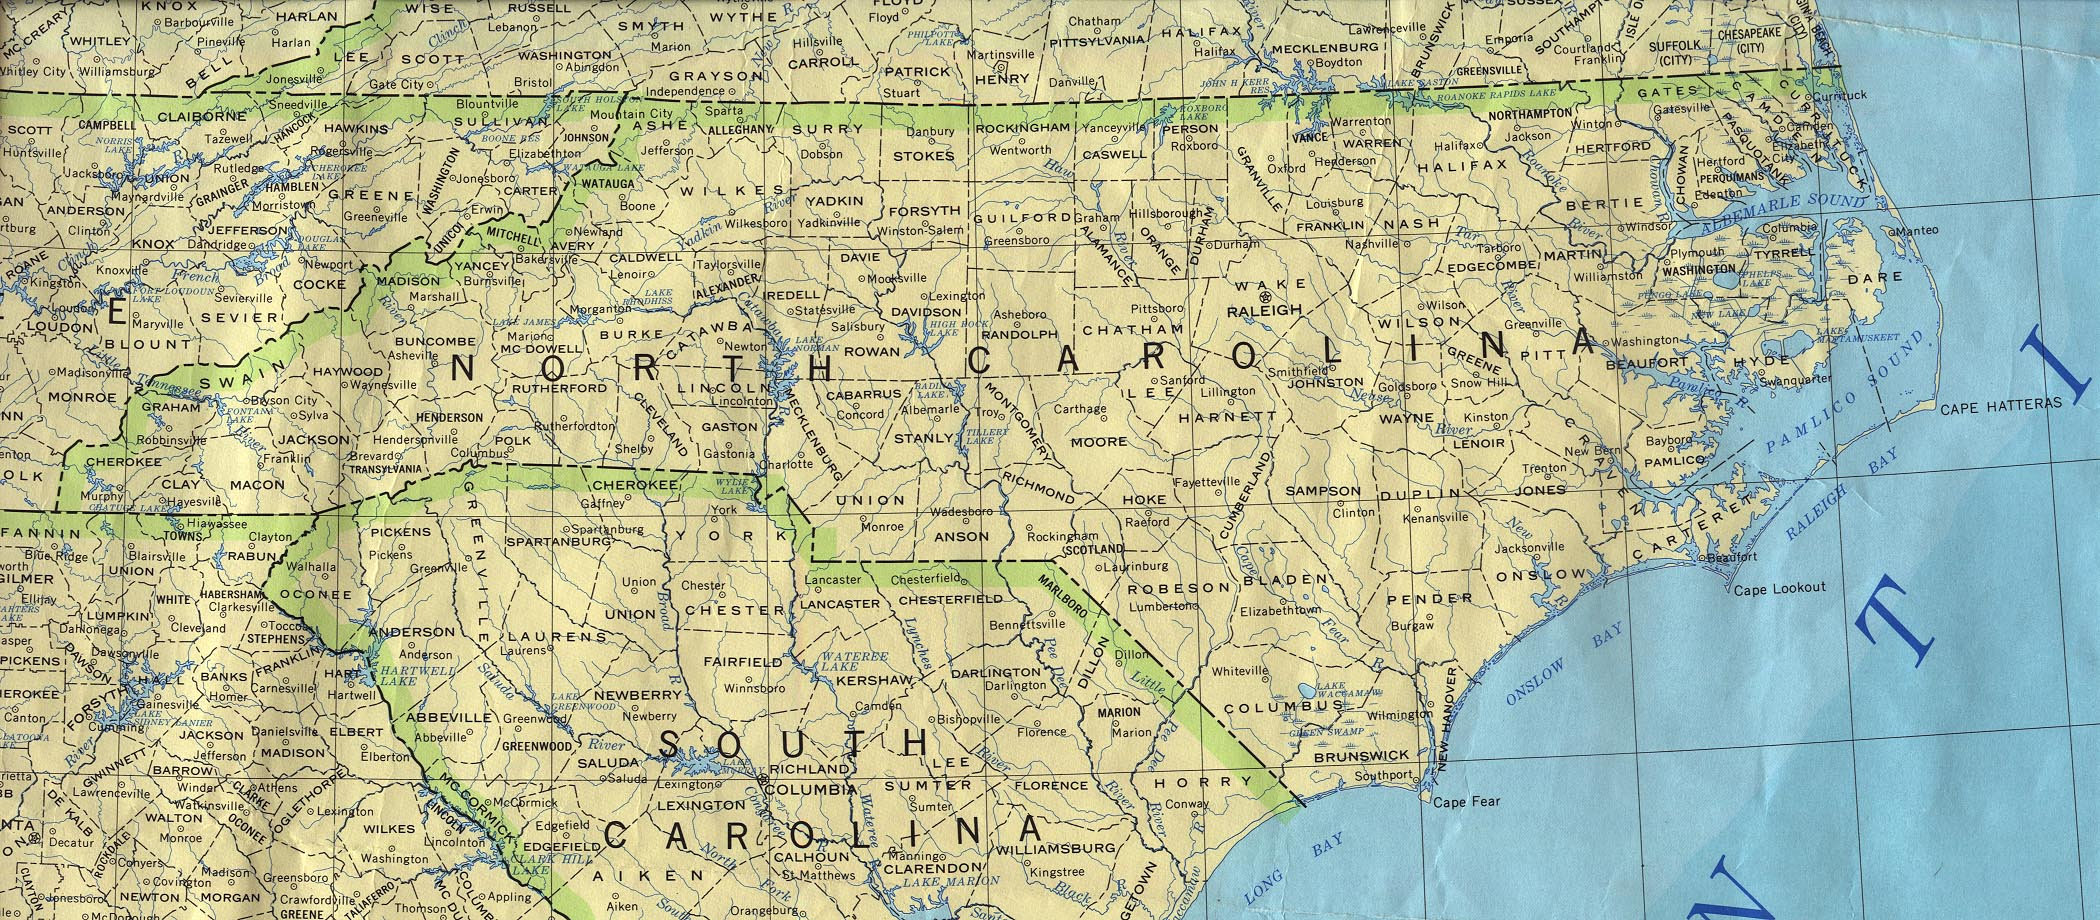 North Carolina Outline Maps And Map Links